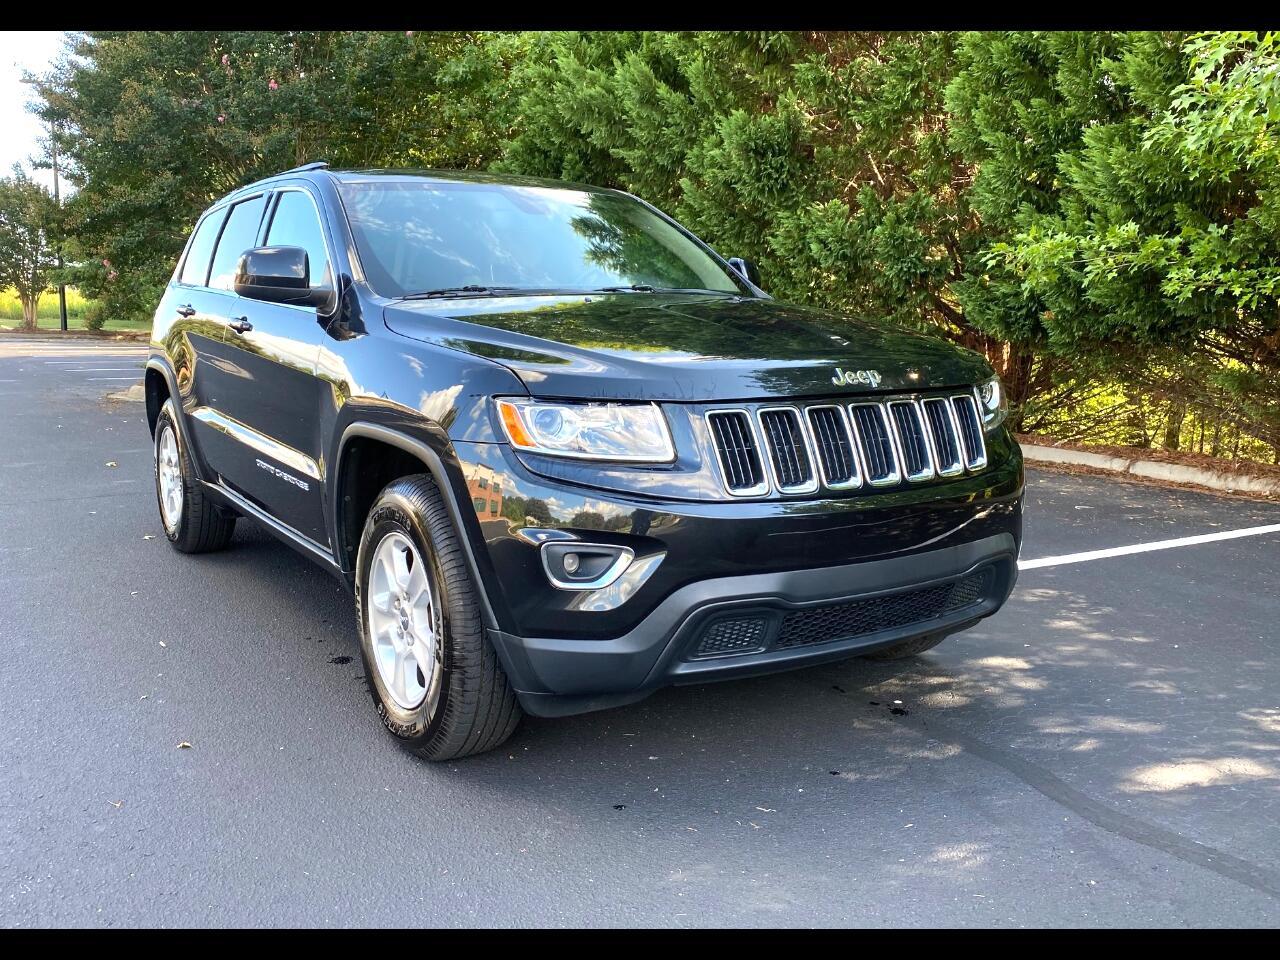 Jeep Grand Cherokee Laredo 2WD 2014